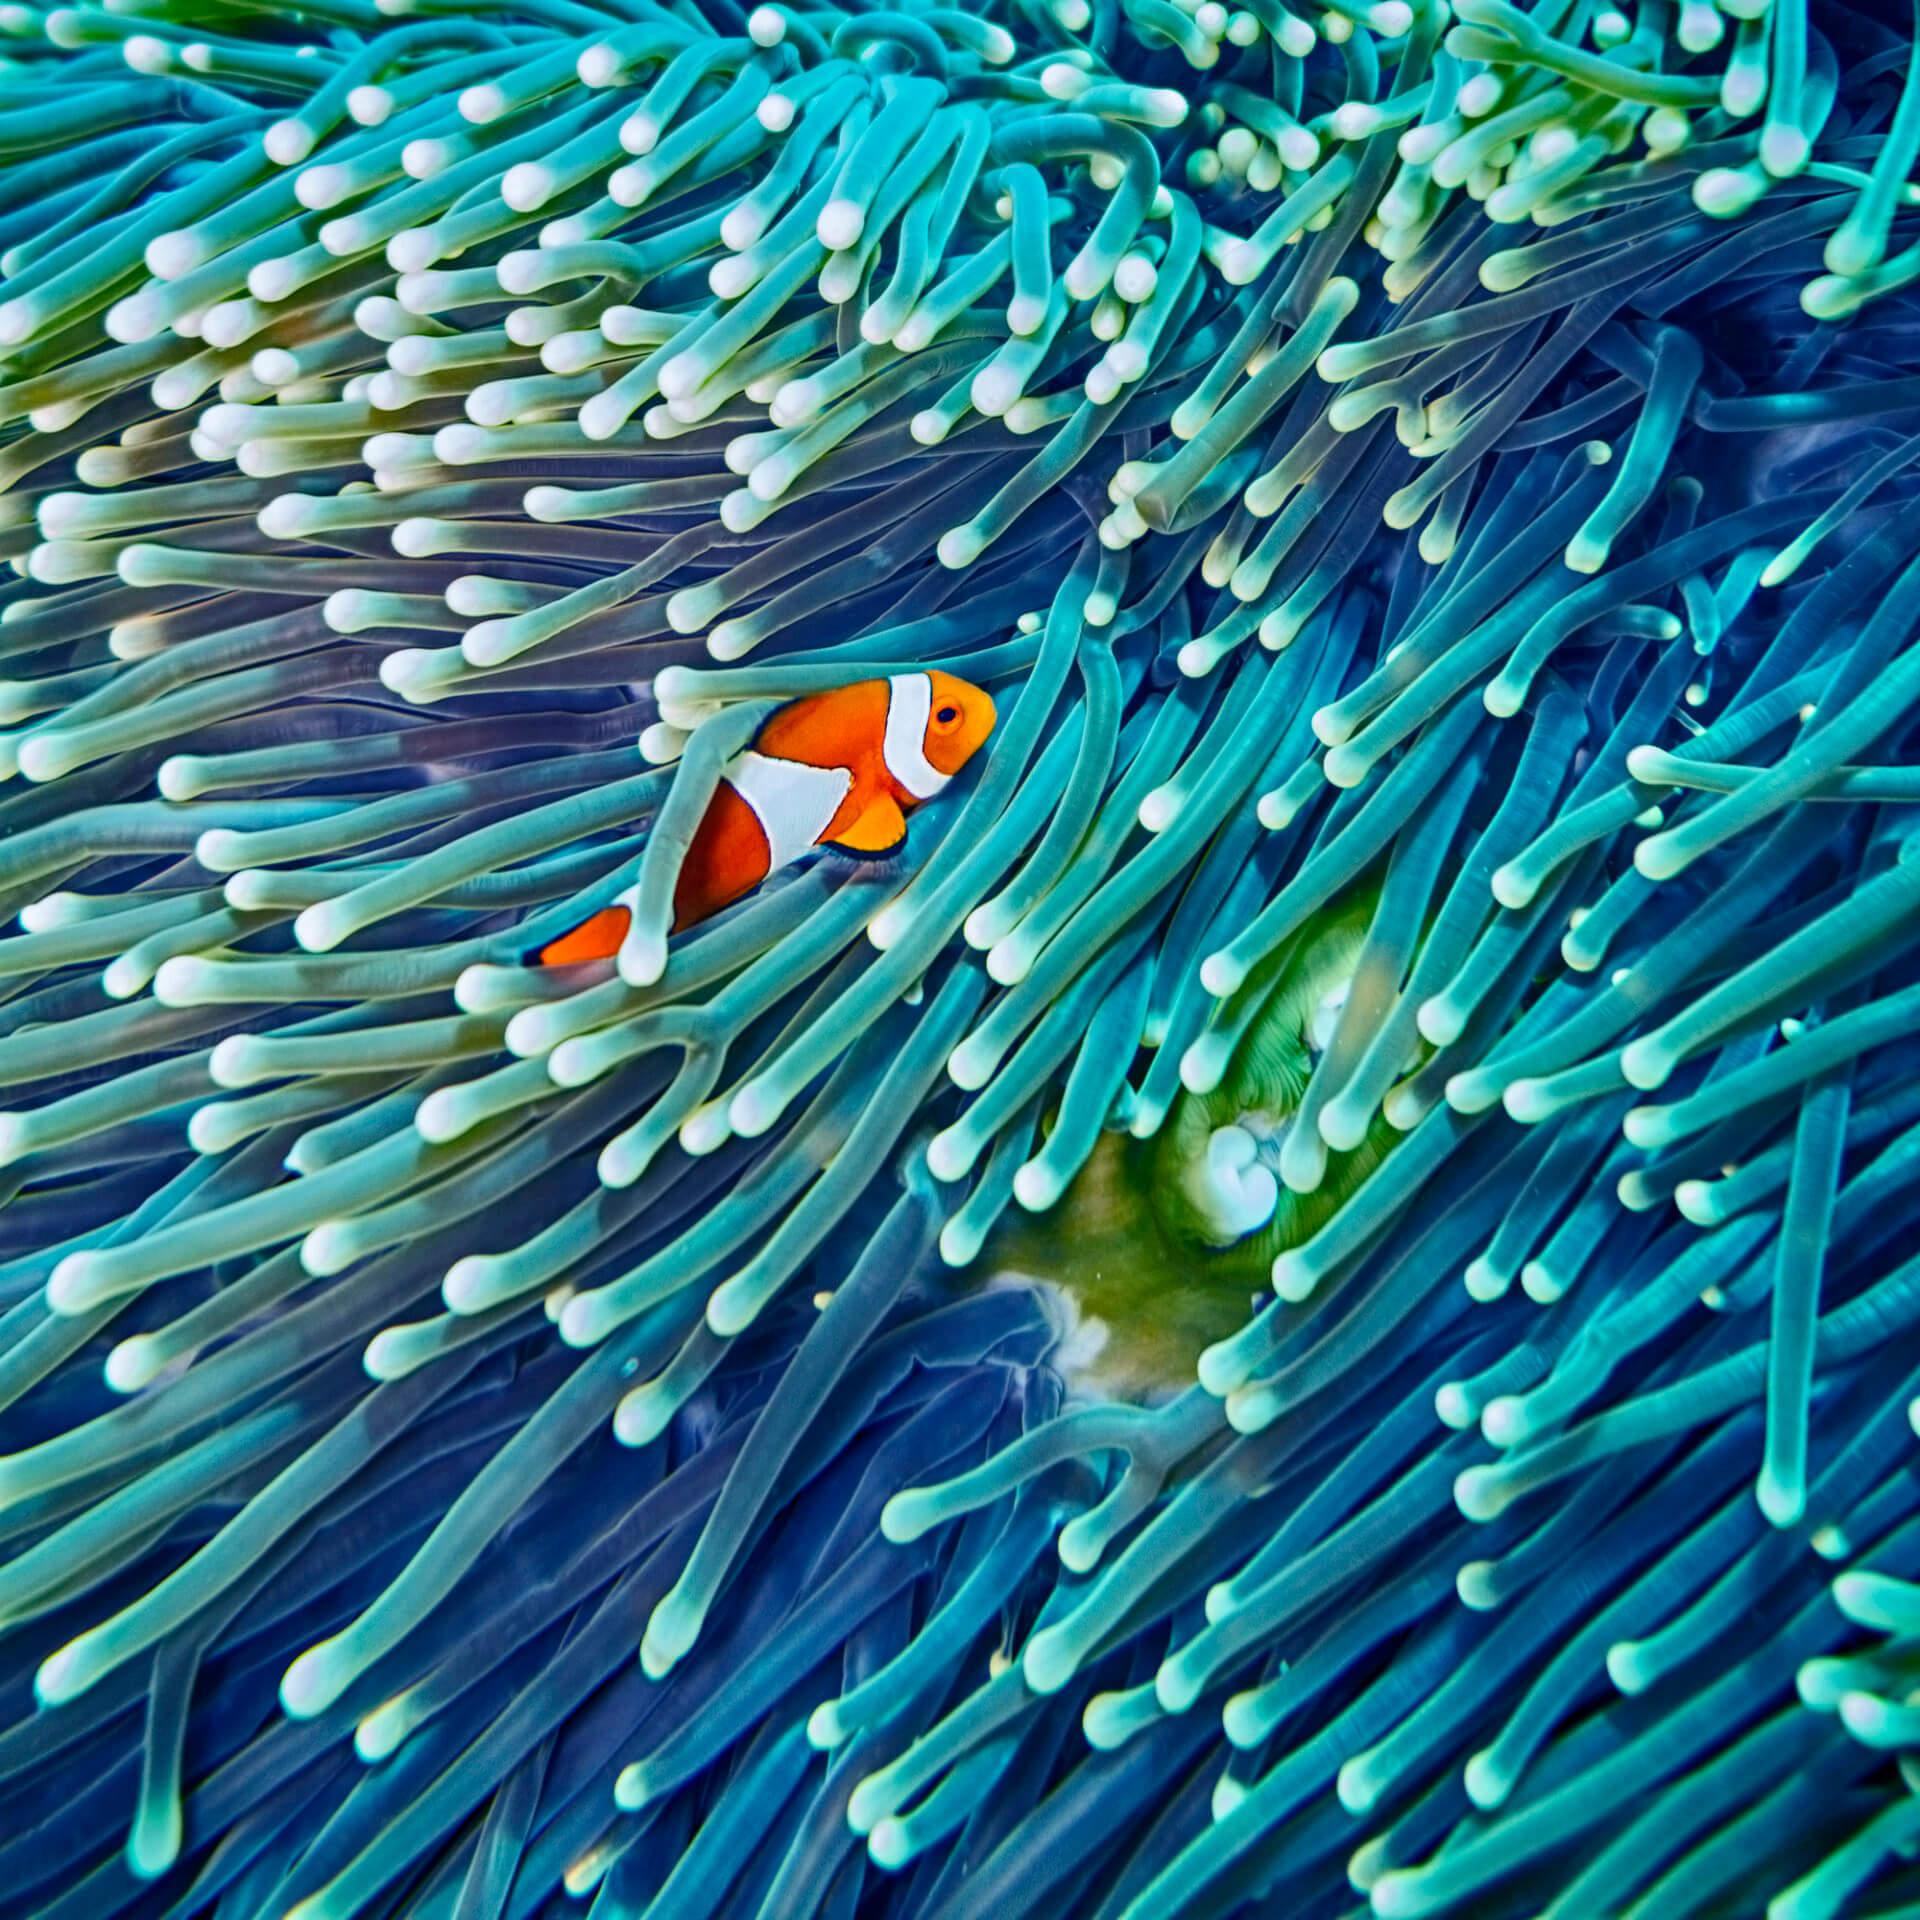 BeBiodiversity Biodiversity is | a balance